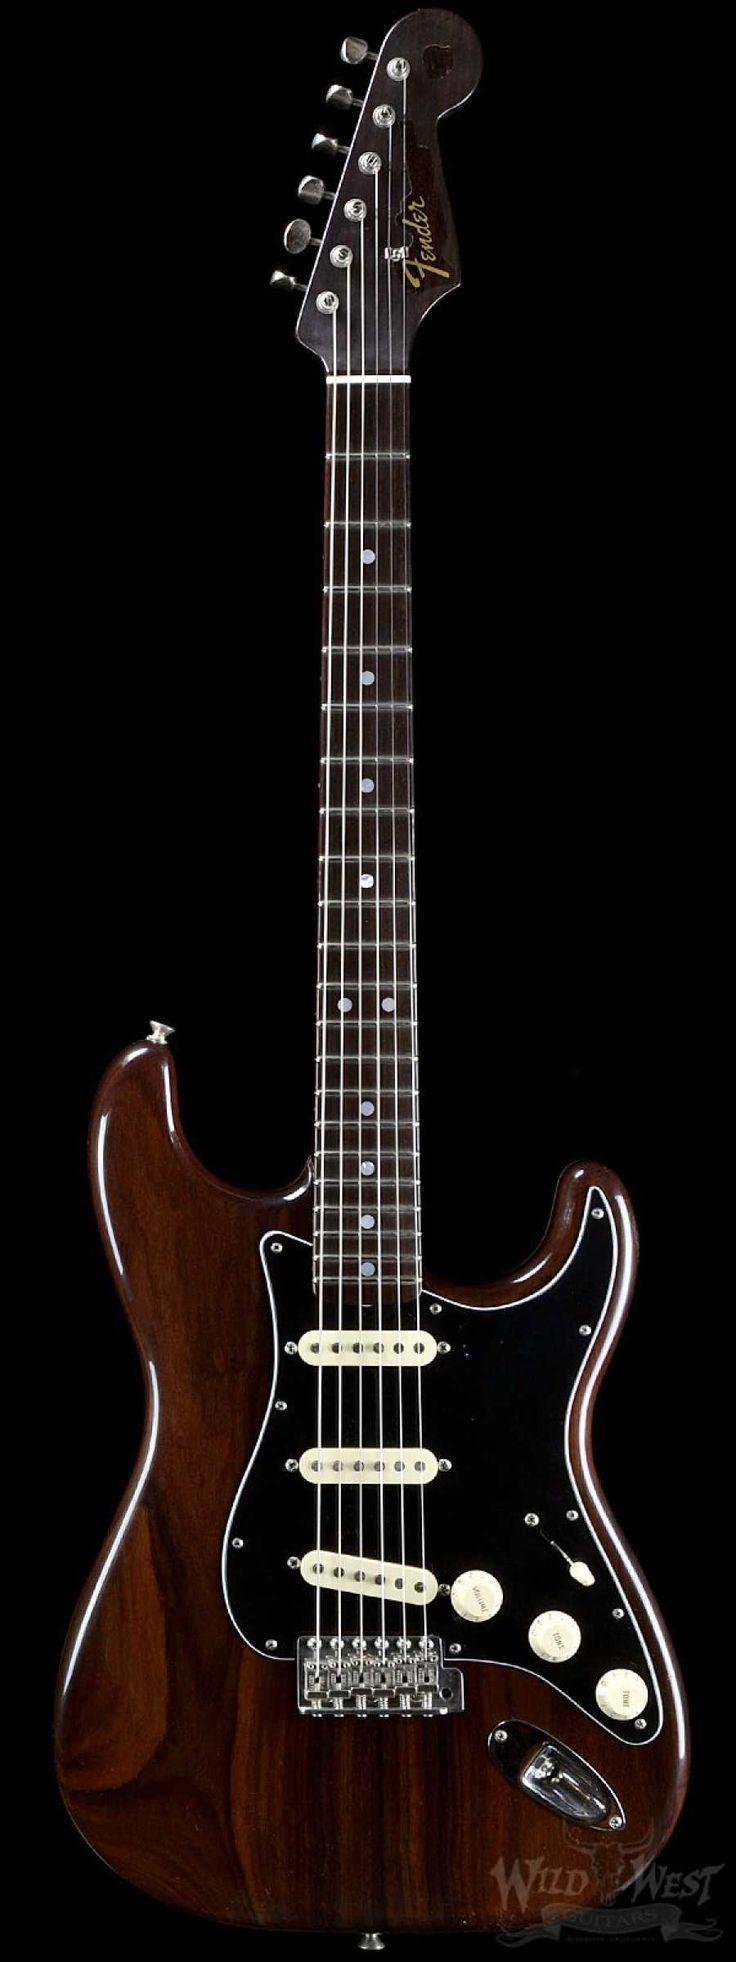 Bullfrog Blues Strat Guitar Wiring Diagram Essig Fender Stratocaster Humbucker Library